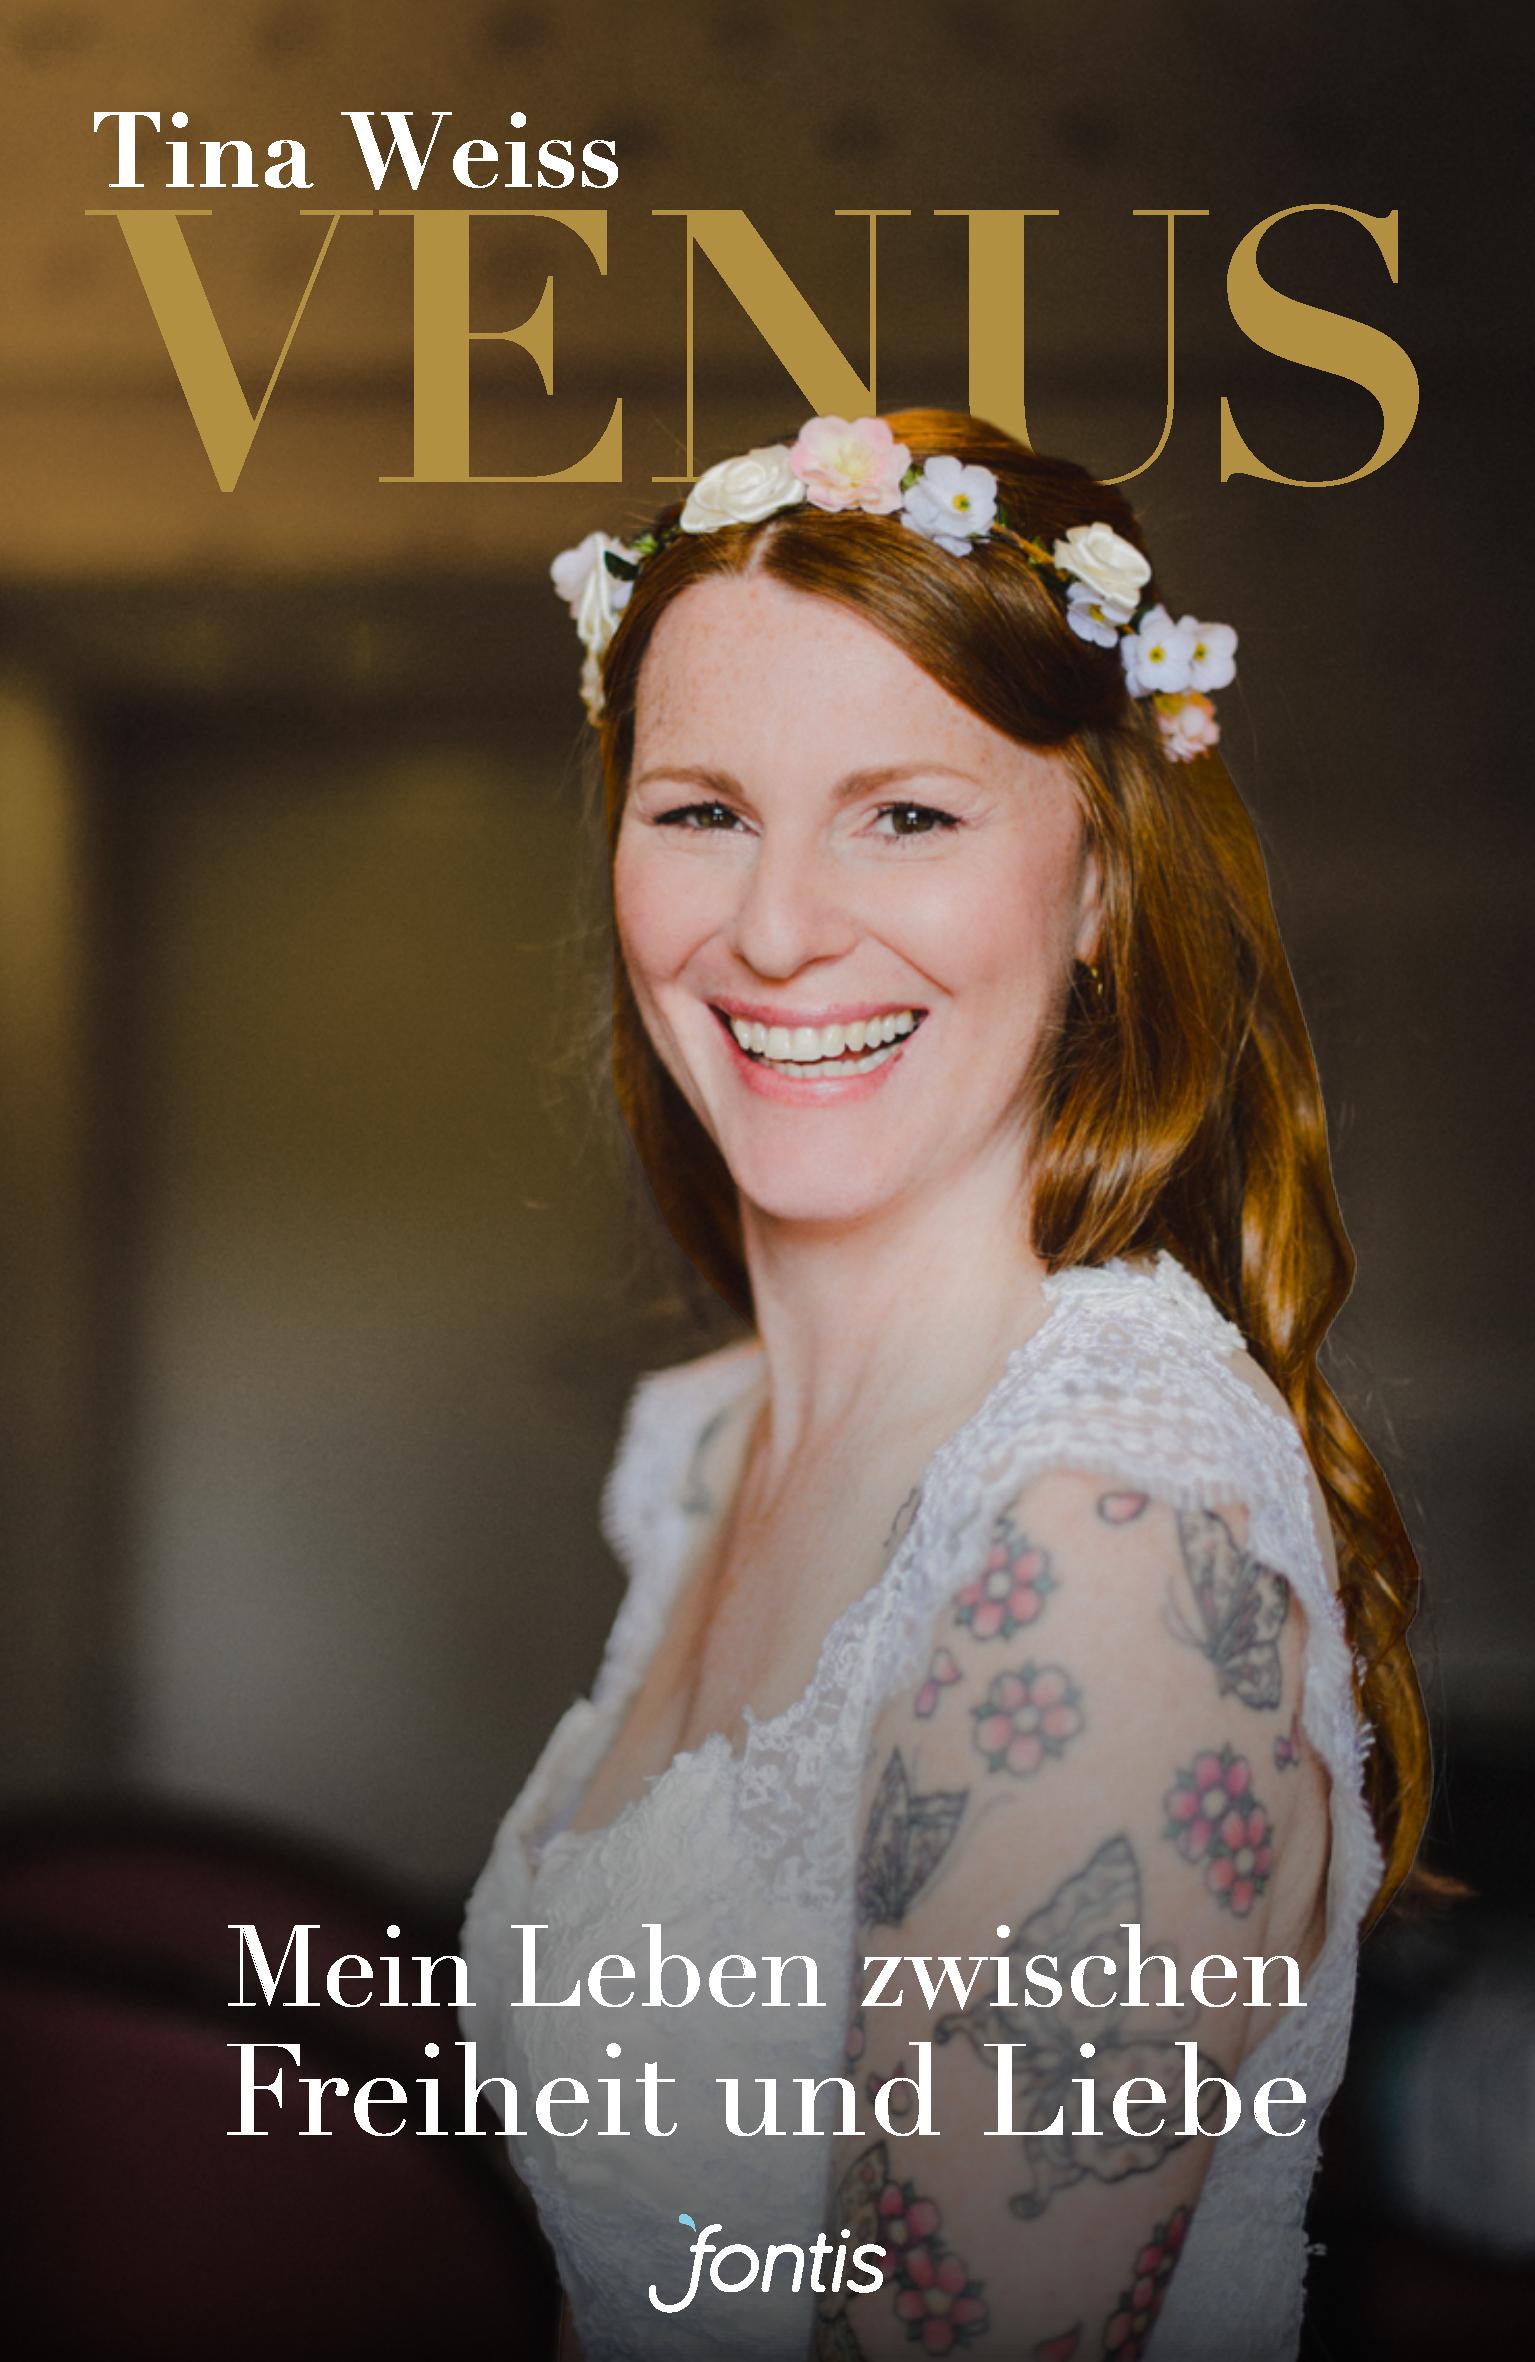 Tina Weiss_Venus_Cover.jpg